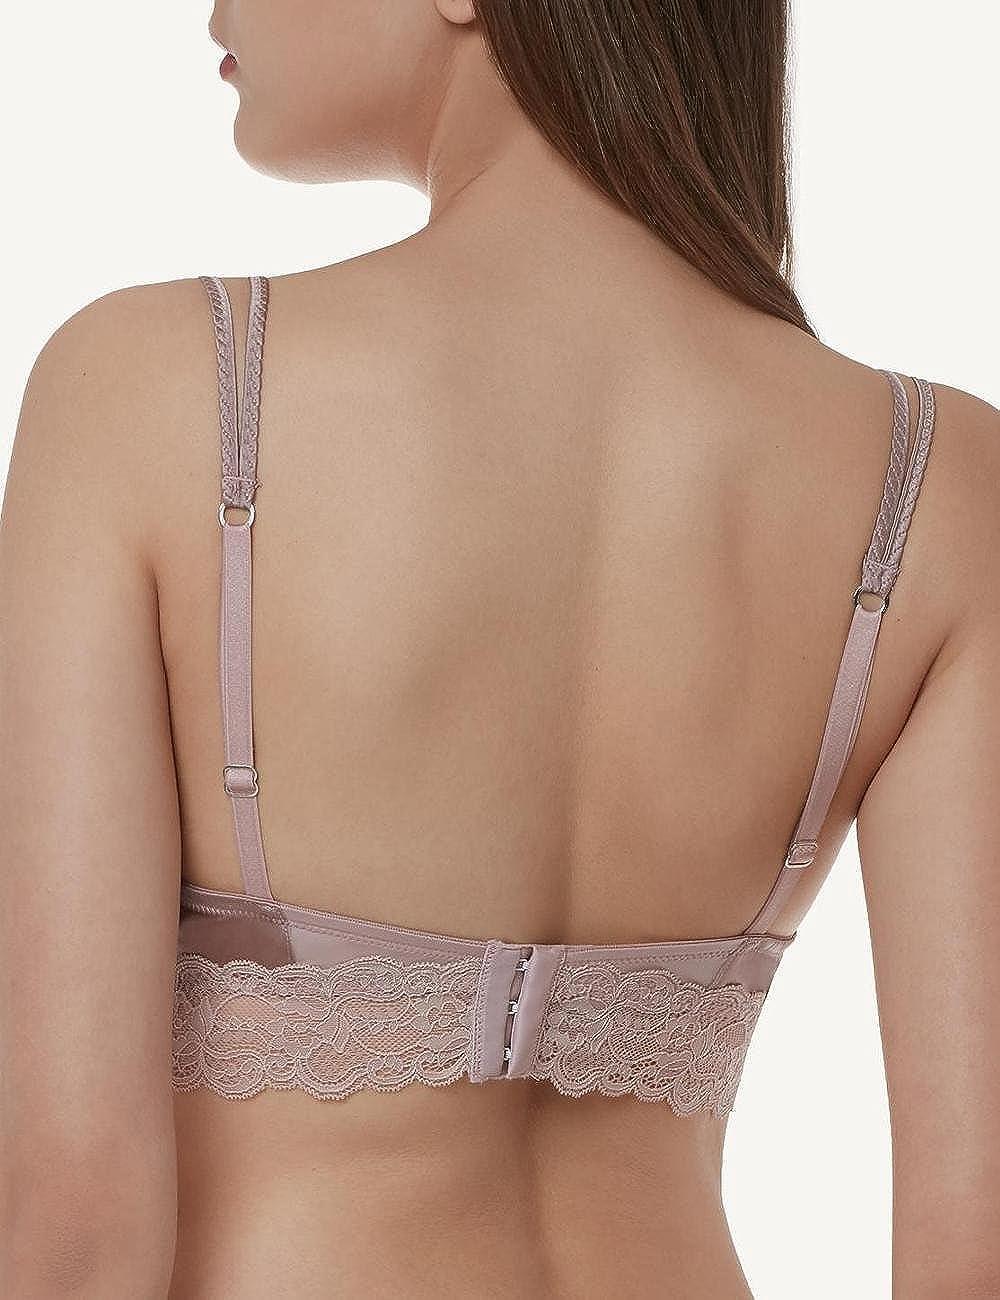 0848f3d538893 Intimissimi Womens Smooth Silk Silvia Push-Up Bra  Amazon.co.uk  Clothing